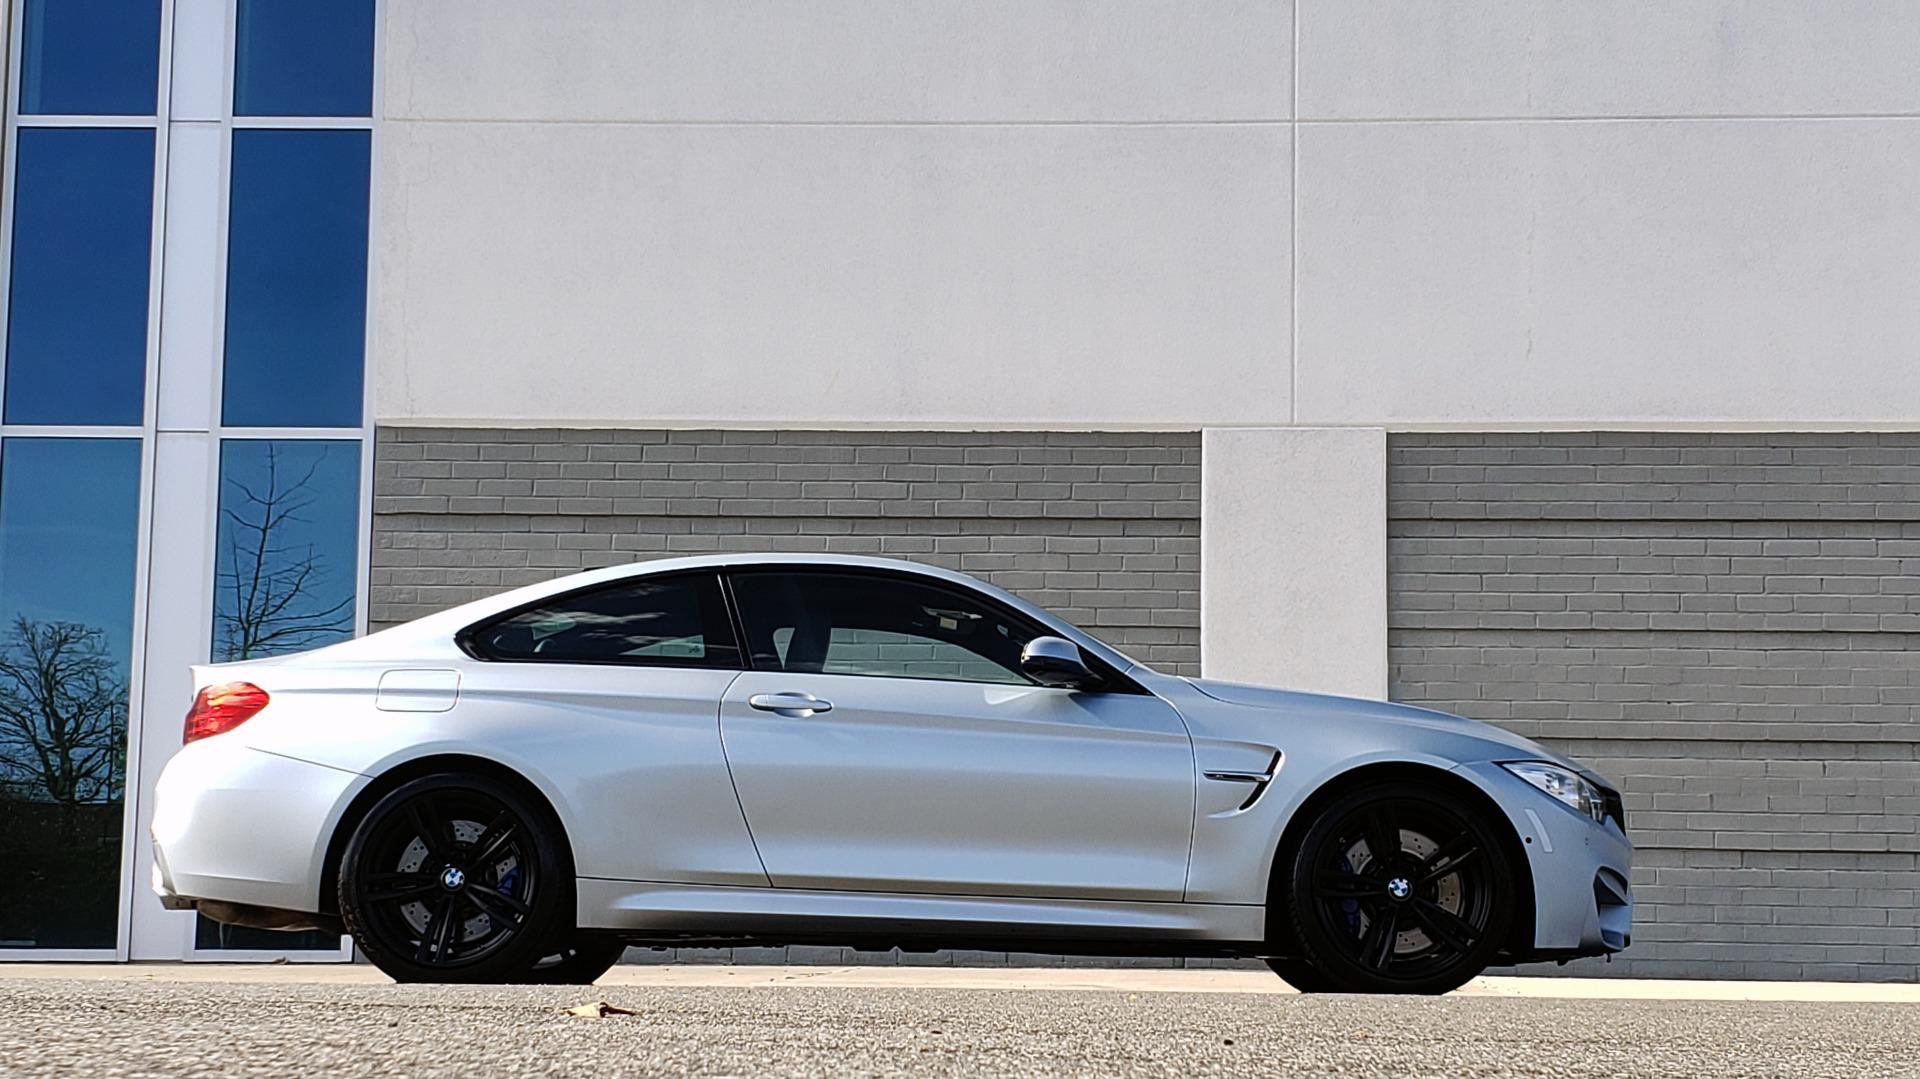 Used 2015 BMW M4 COUPE / EXEC PKG / DRVR ASST PLUS / LIGHTING / M-SUSPENSION for sale Sold at Formula Imports in Charlotte NC 28227 7